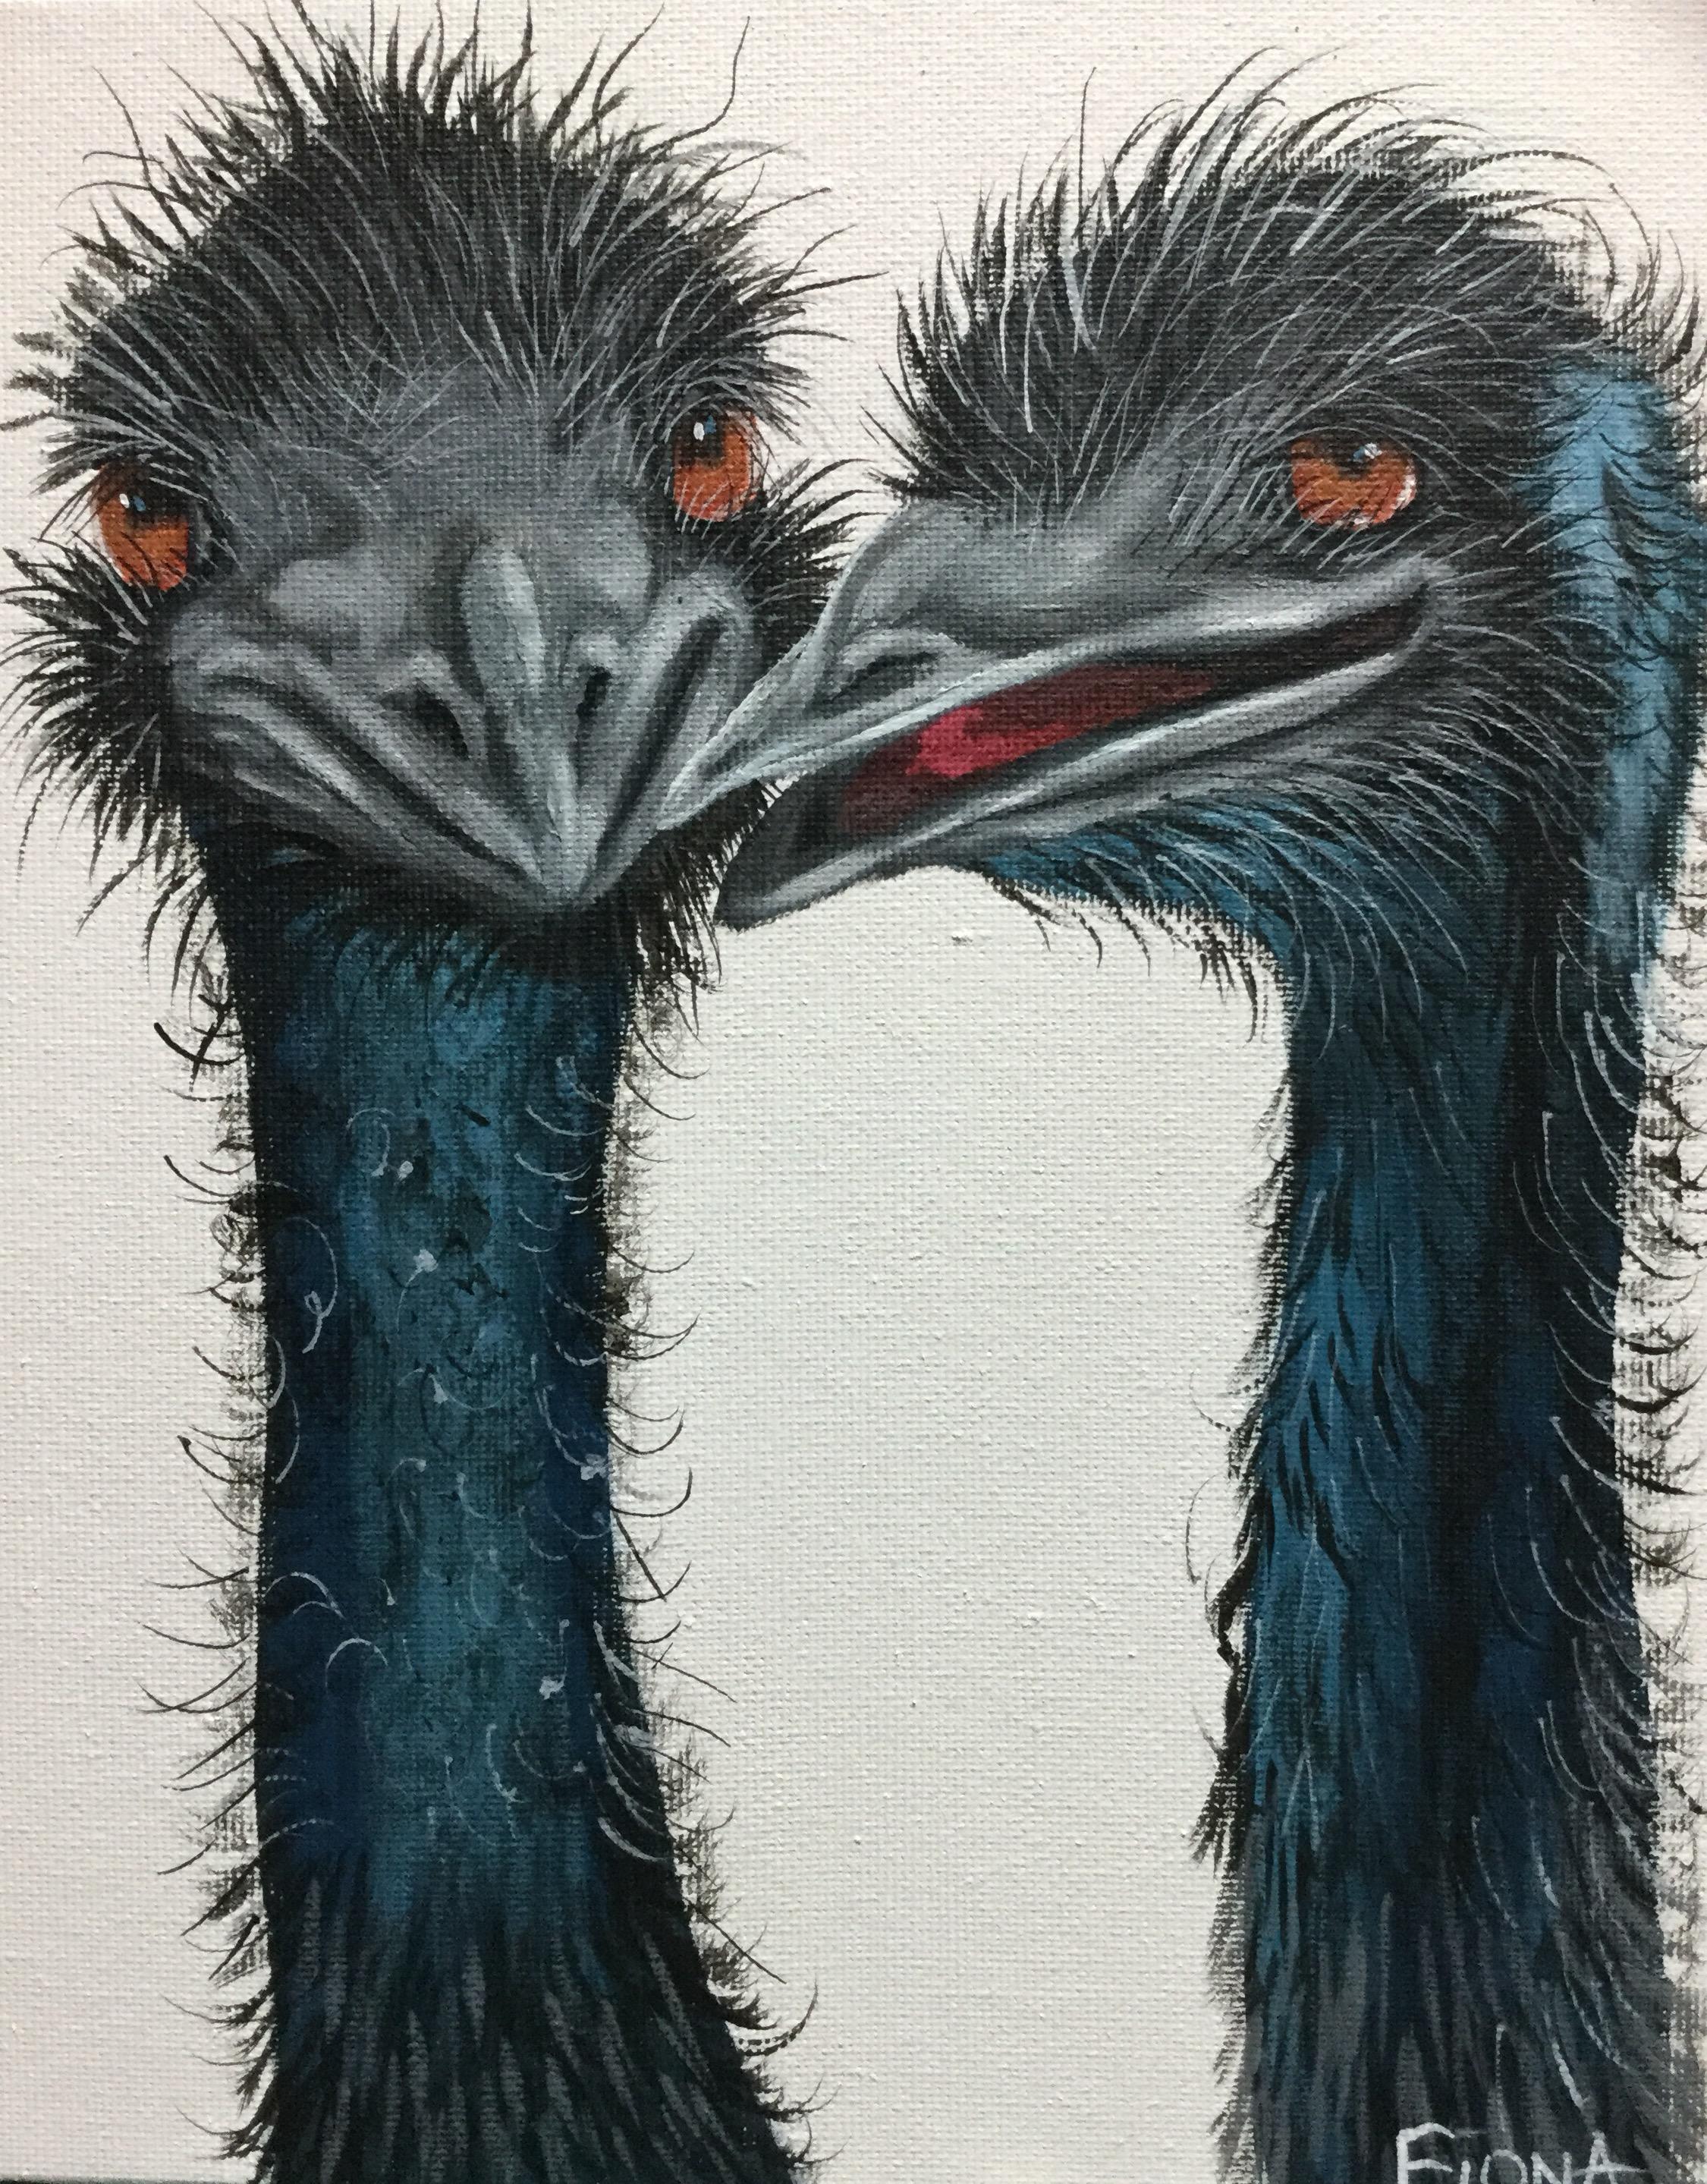 the emus